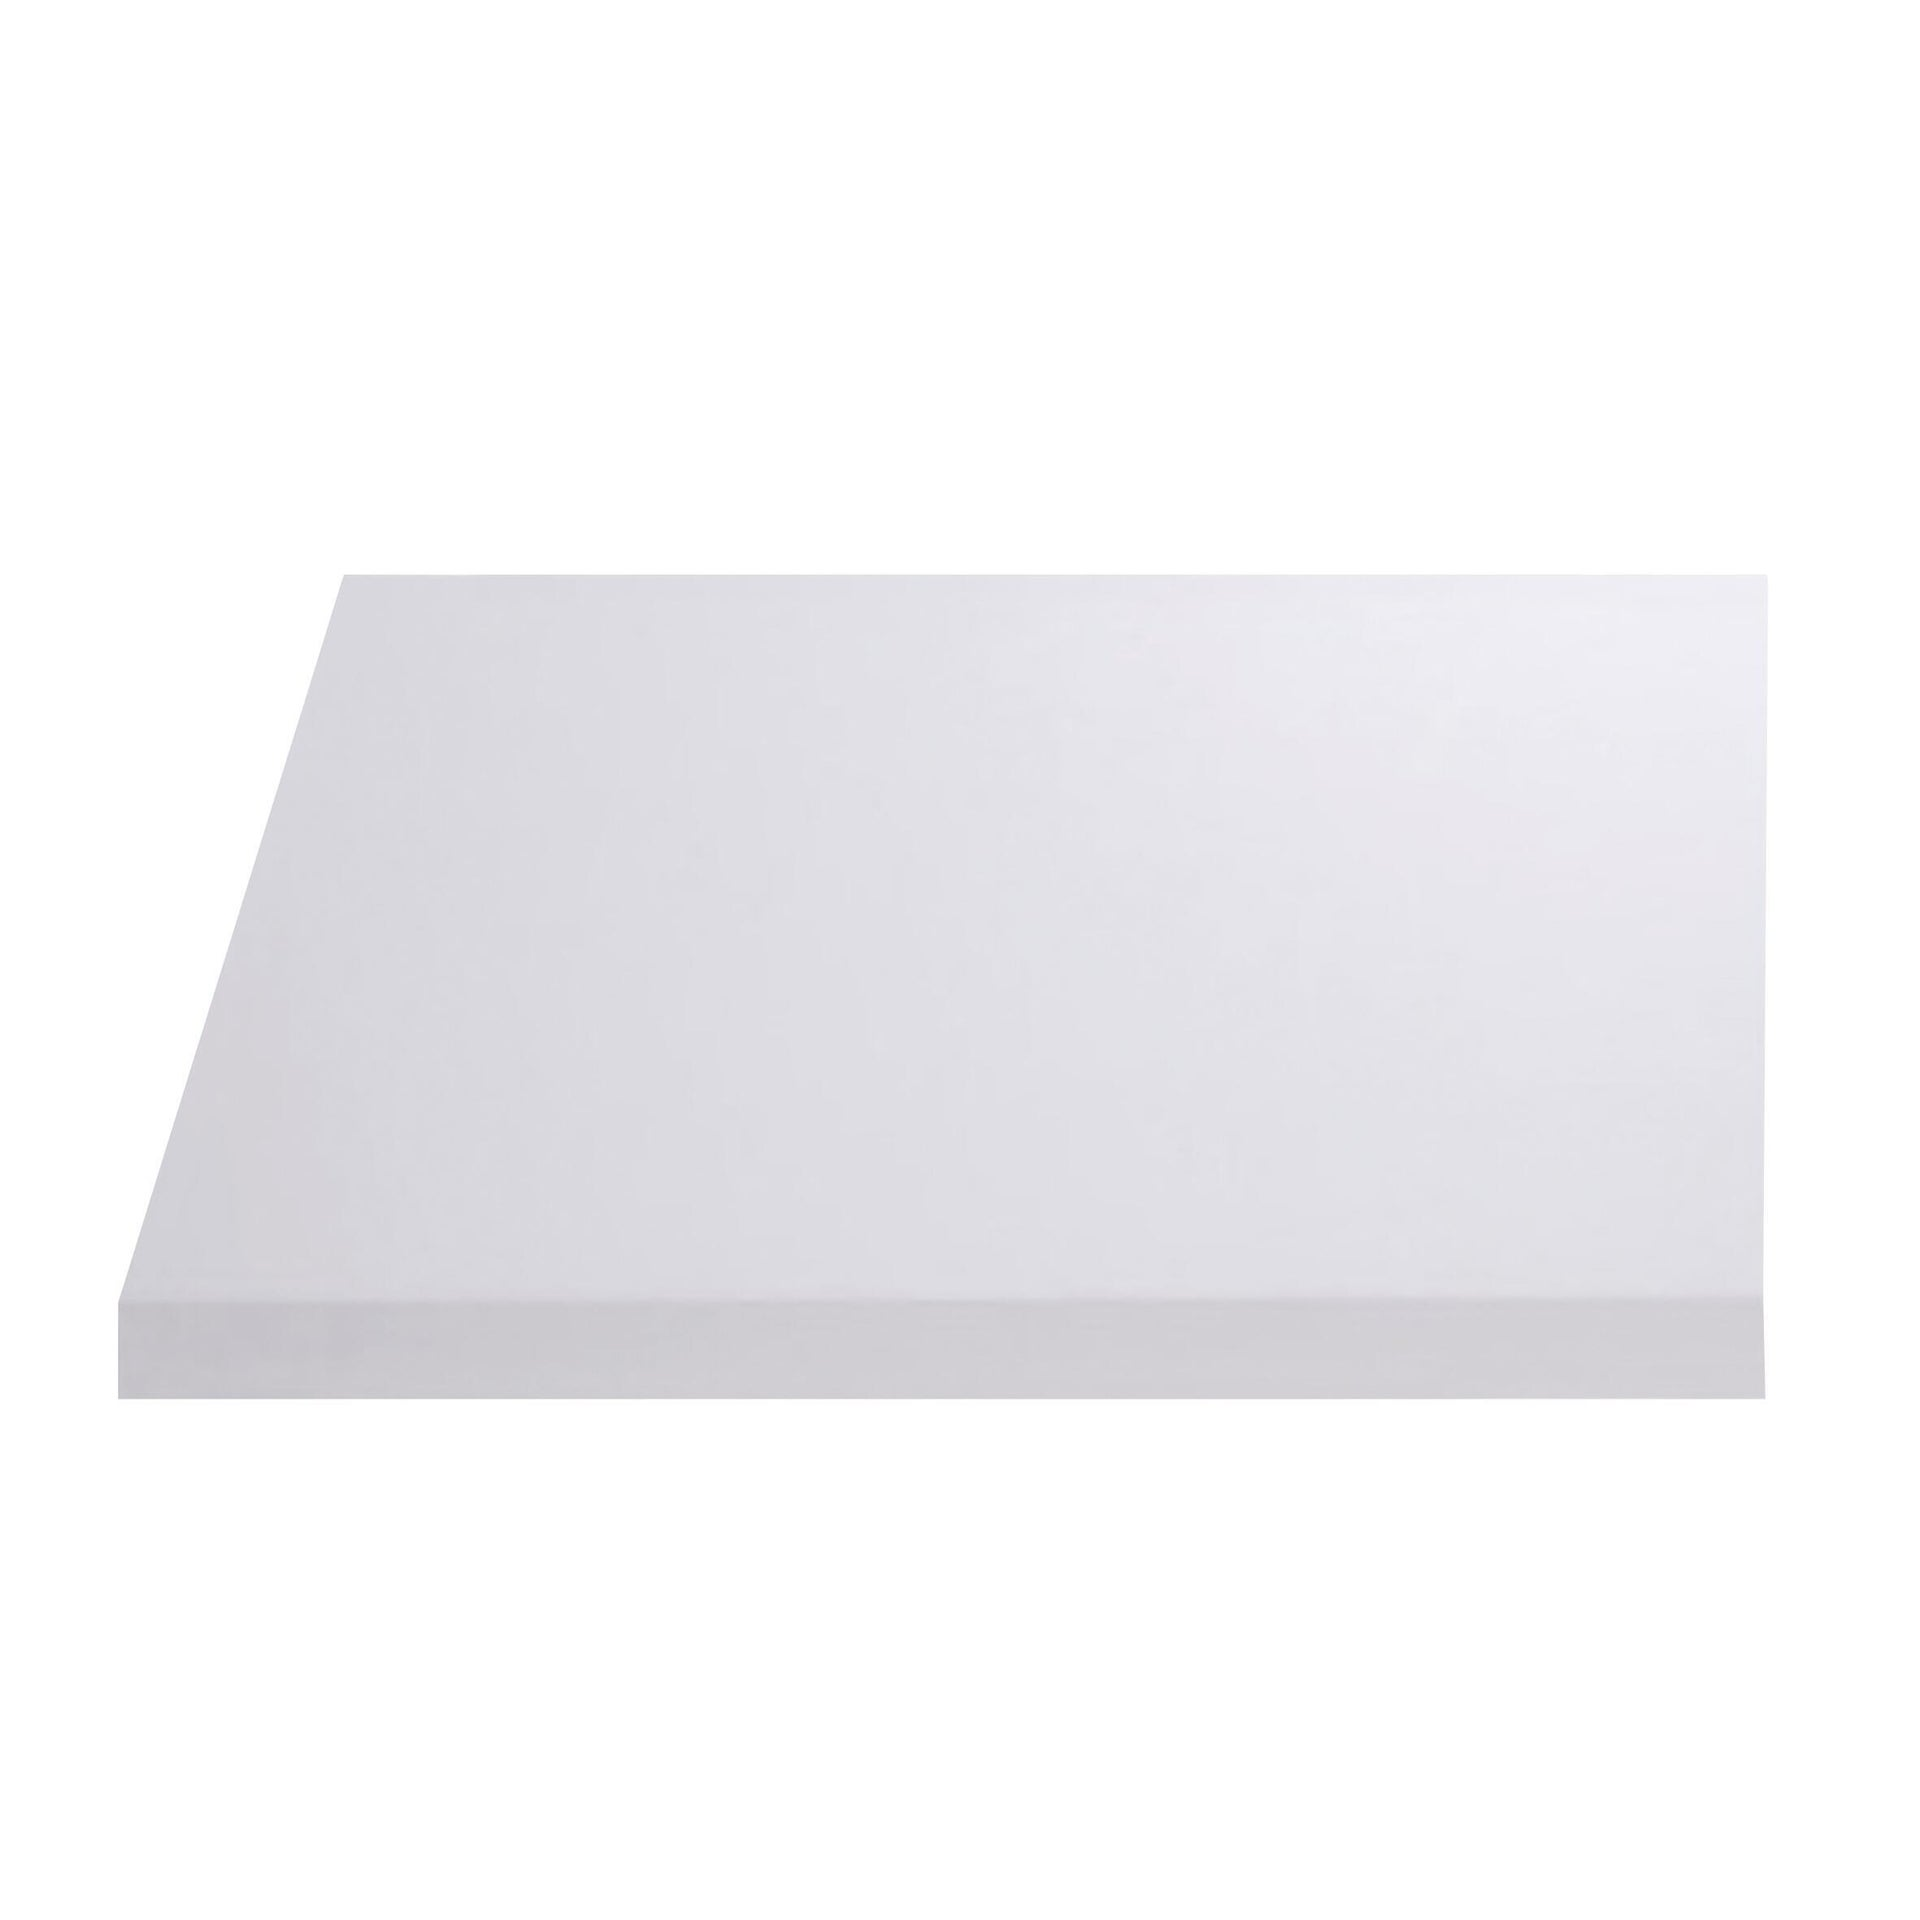 Top per lavabo SENSEA Remix L 90 x P 49 x H 3.8 cm lucido - 1